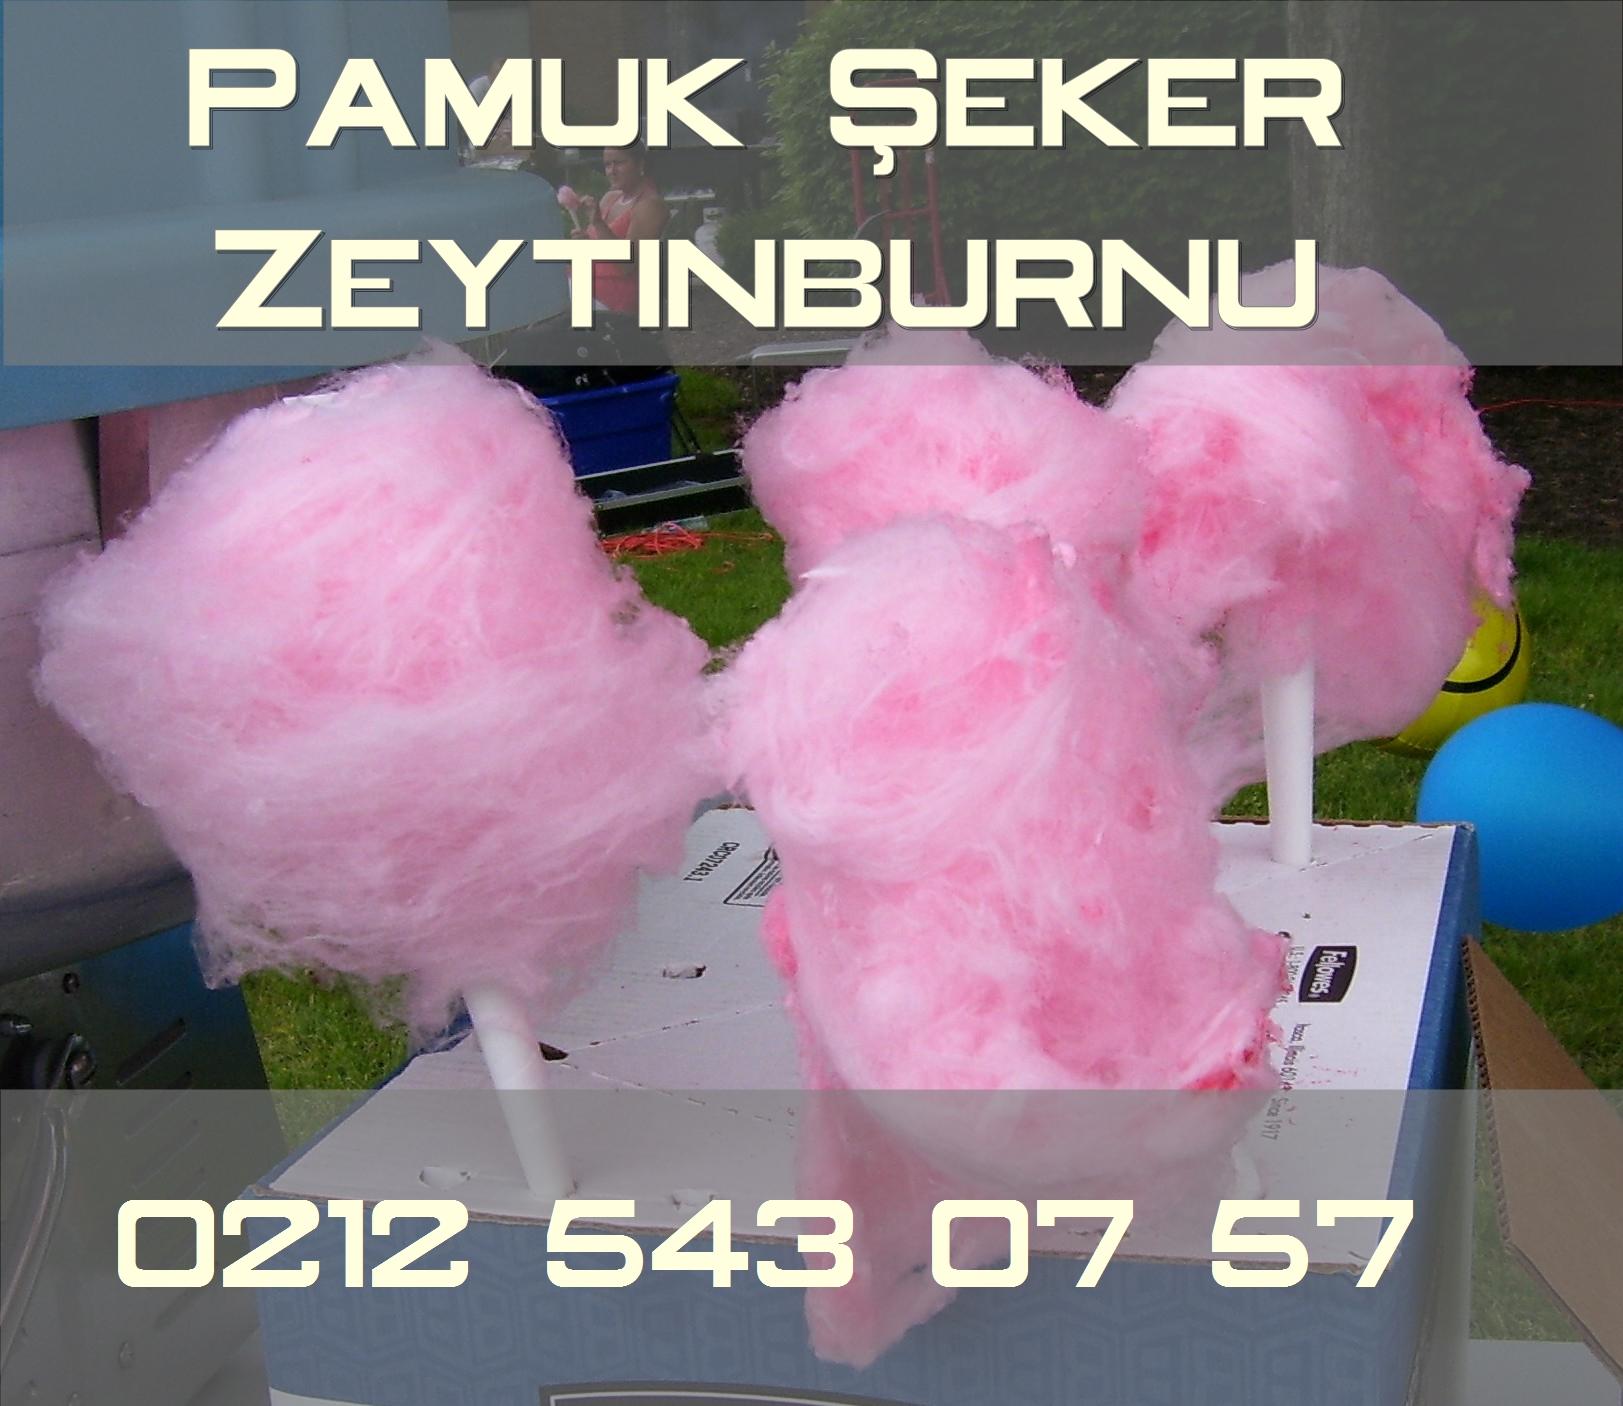 Zeytinburnu pamuk şekeri